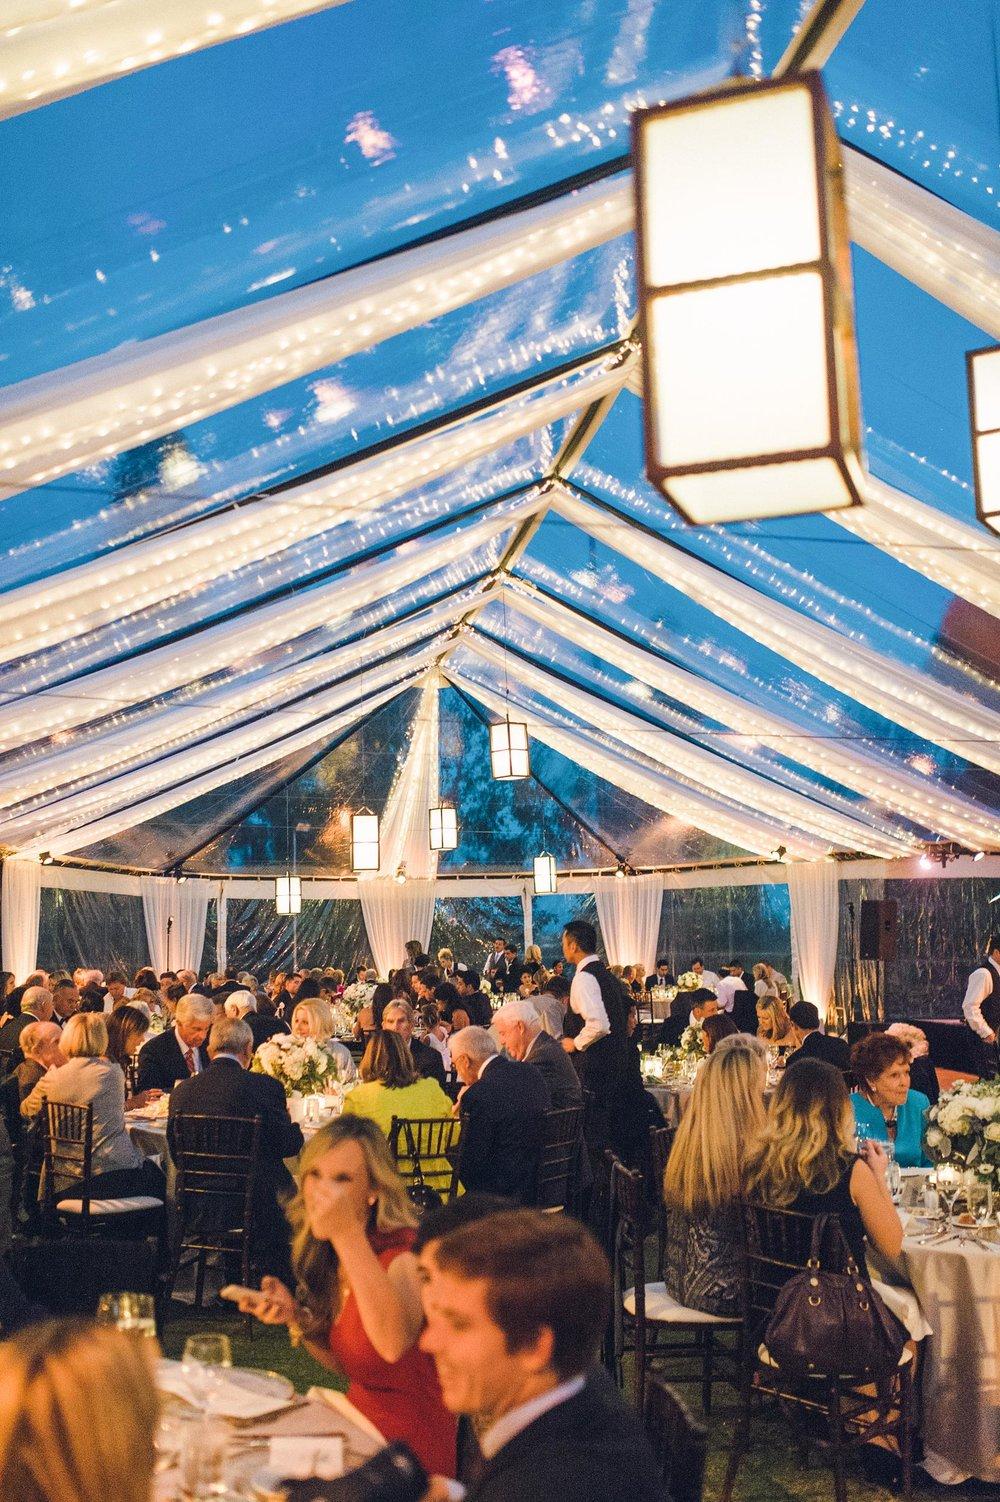 annandale-golf-club-pasadena-wedding-JM-26.jpg